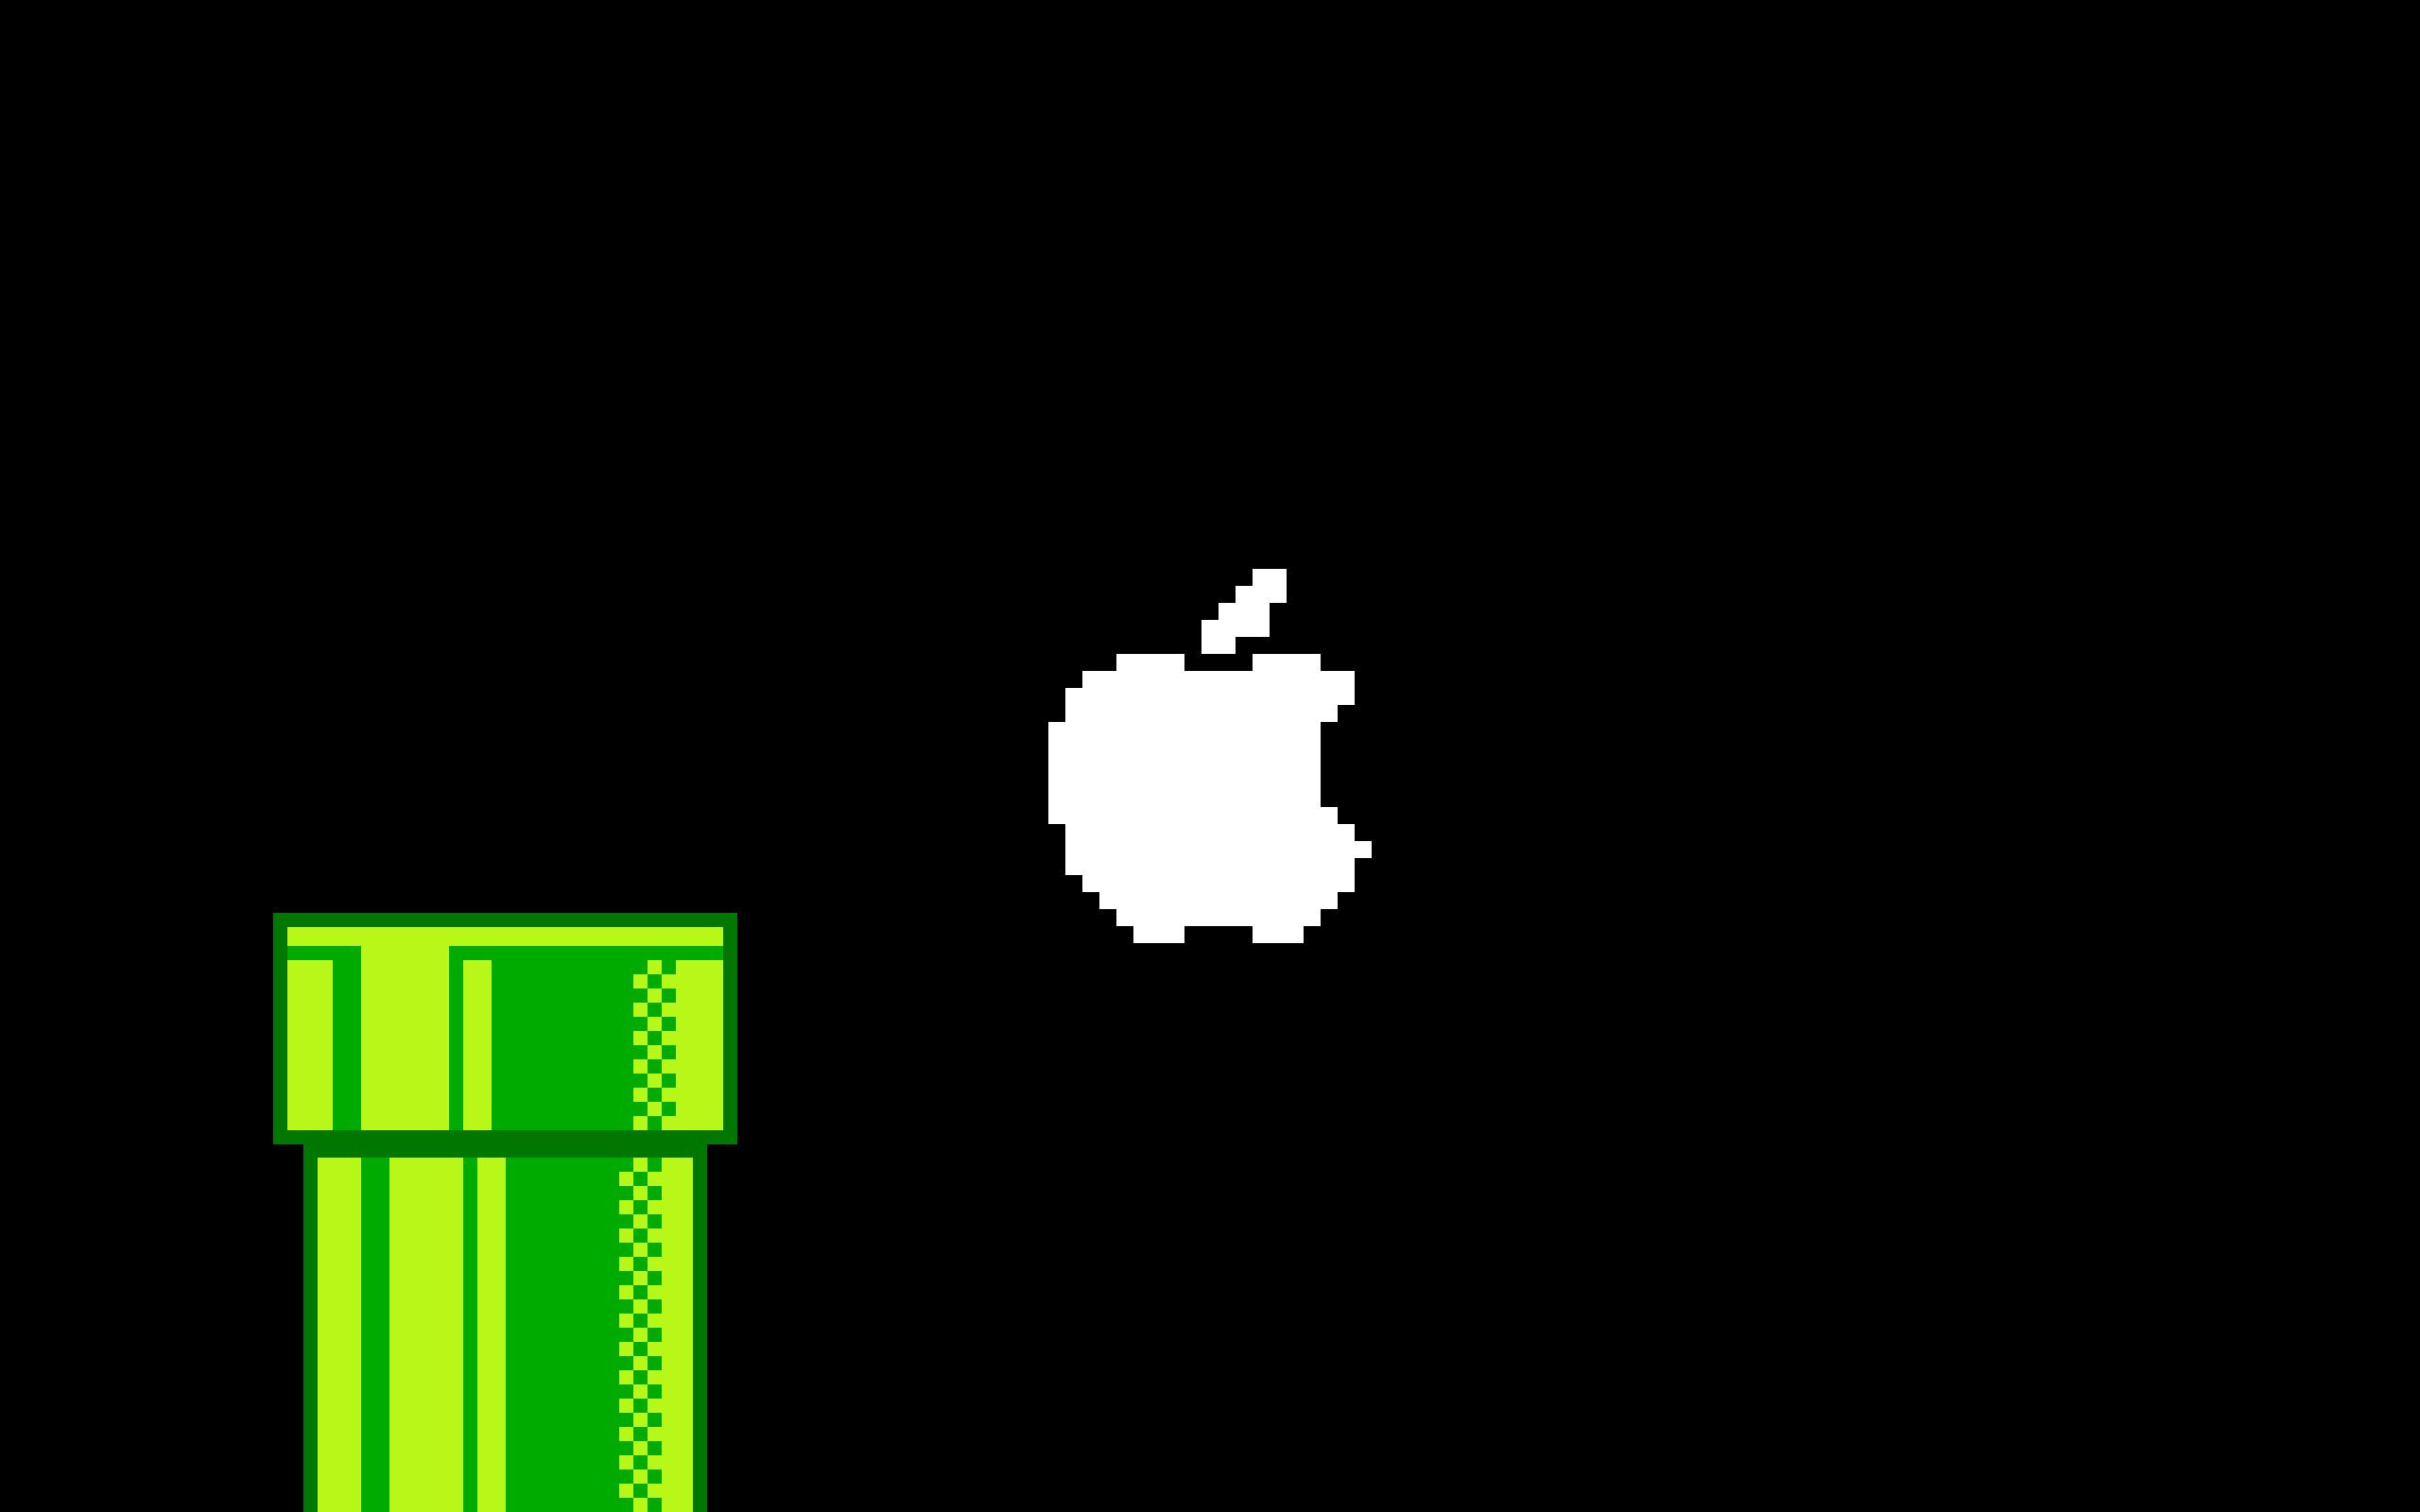 … 8 Bit Mario Wallpaper Images Hd. Download